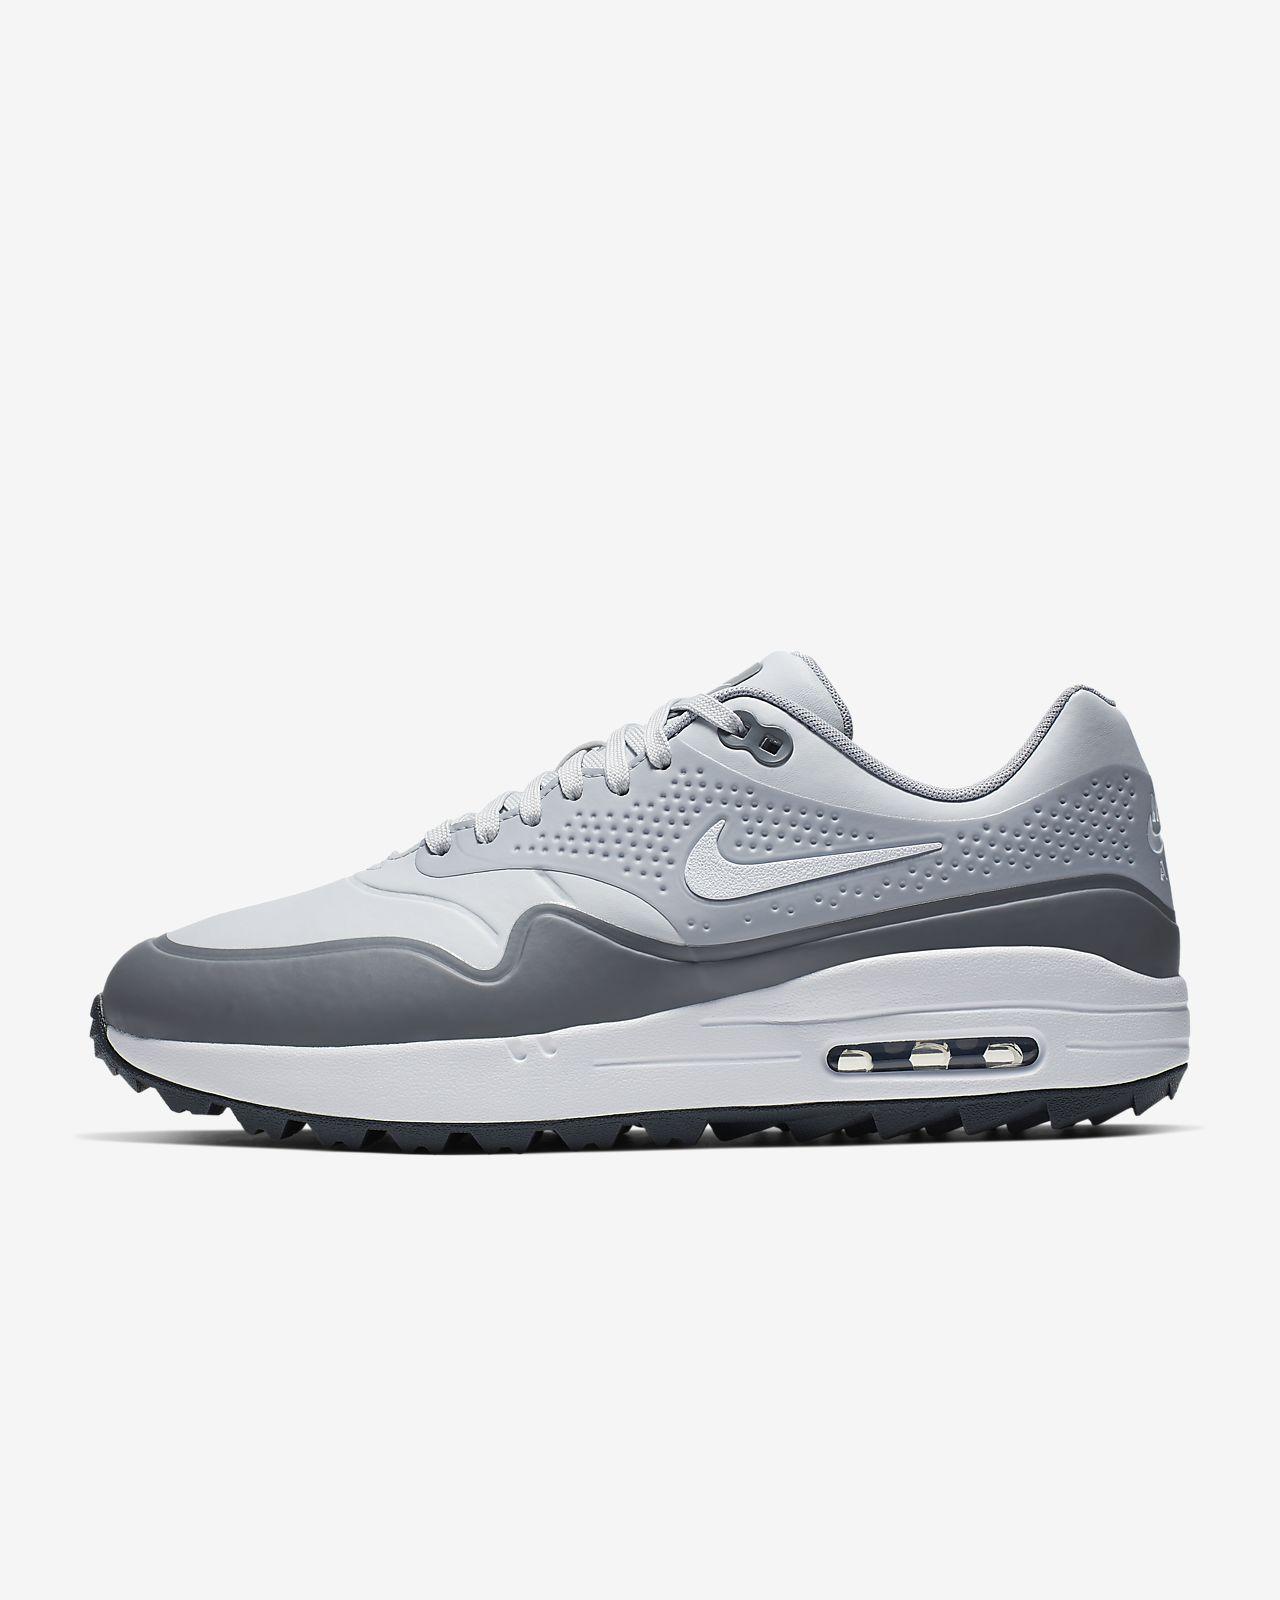 sports shoes dc58f 07507 ... Chaussure de golf Nike Air Max 1 G pour Homme